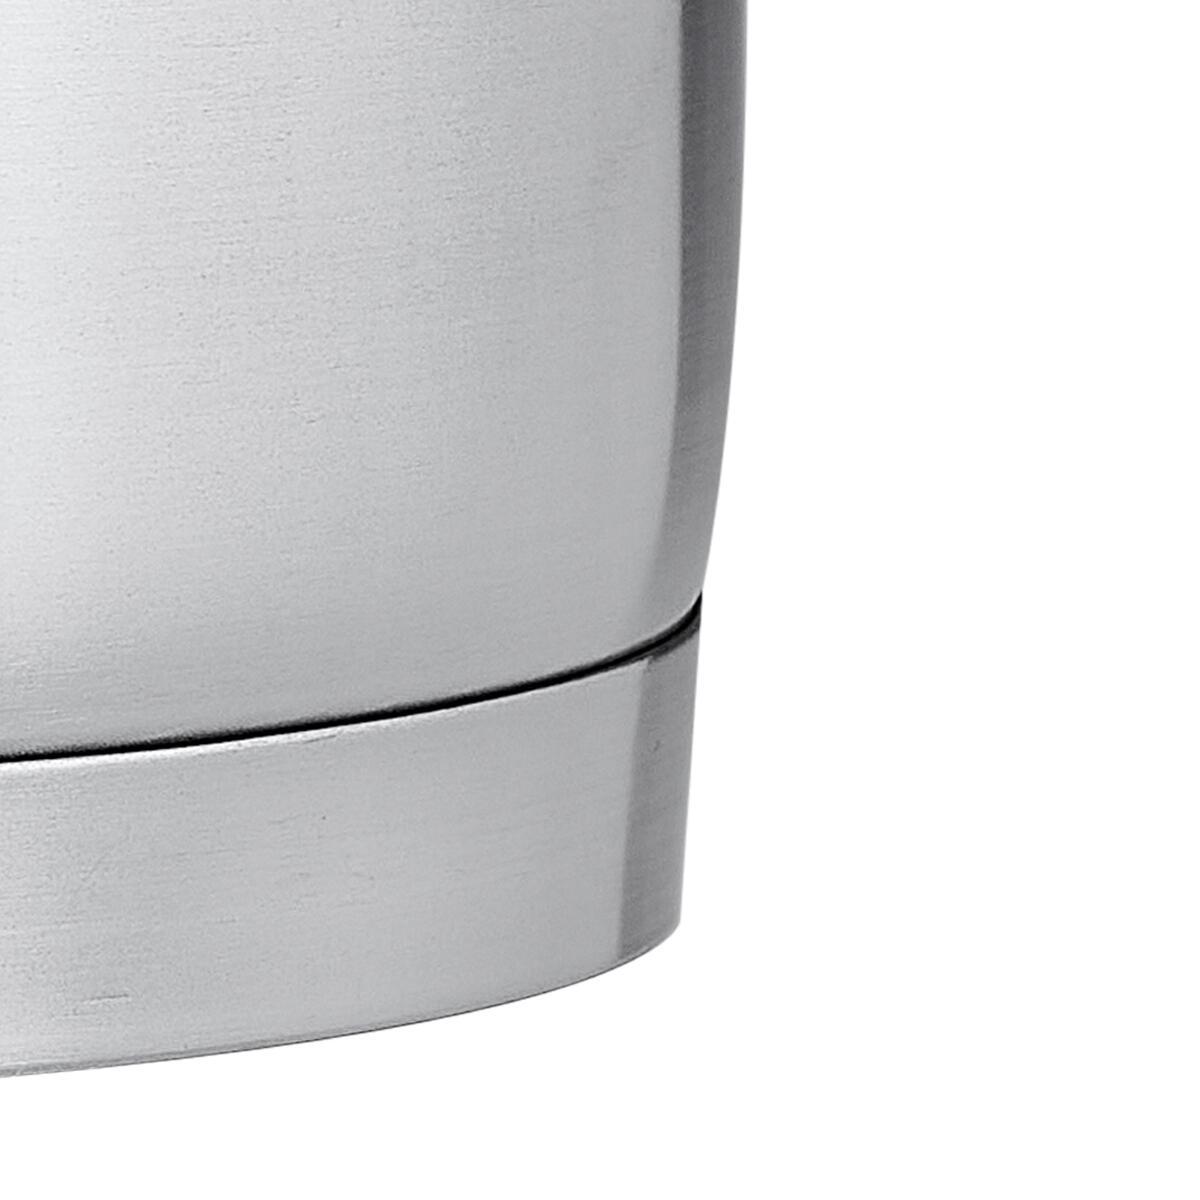 Korkmaz Proline 20x12 cm Kapaklı Sos Tenceresi